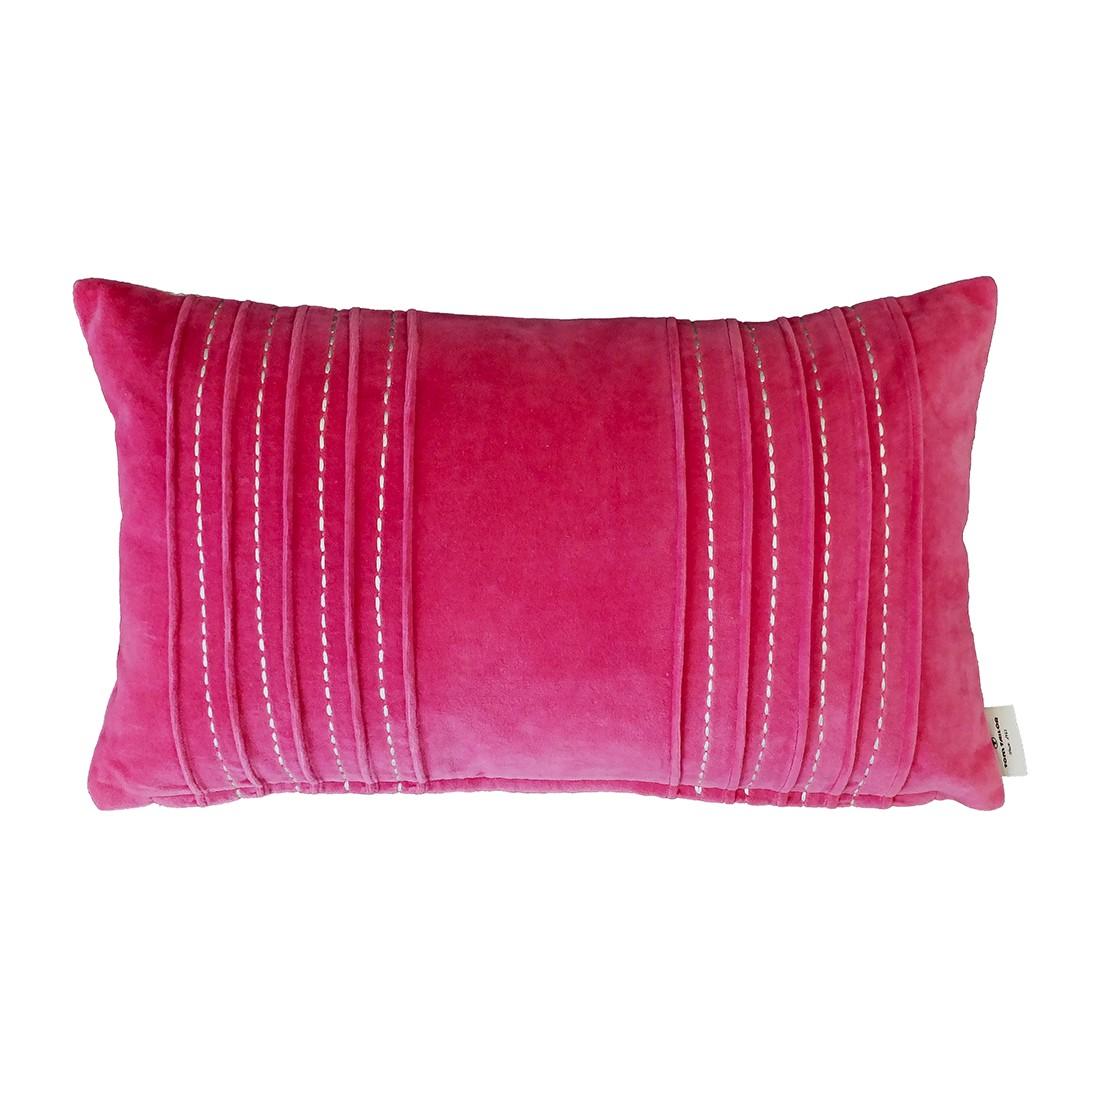 Kissenhülle T-Plush – Pink – Maße: 30 x 50 cm, Tom Tailor günstig